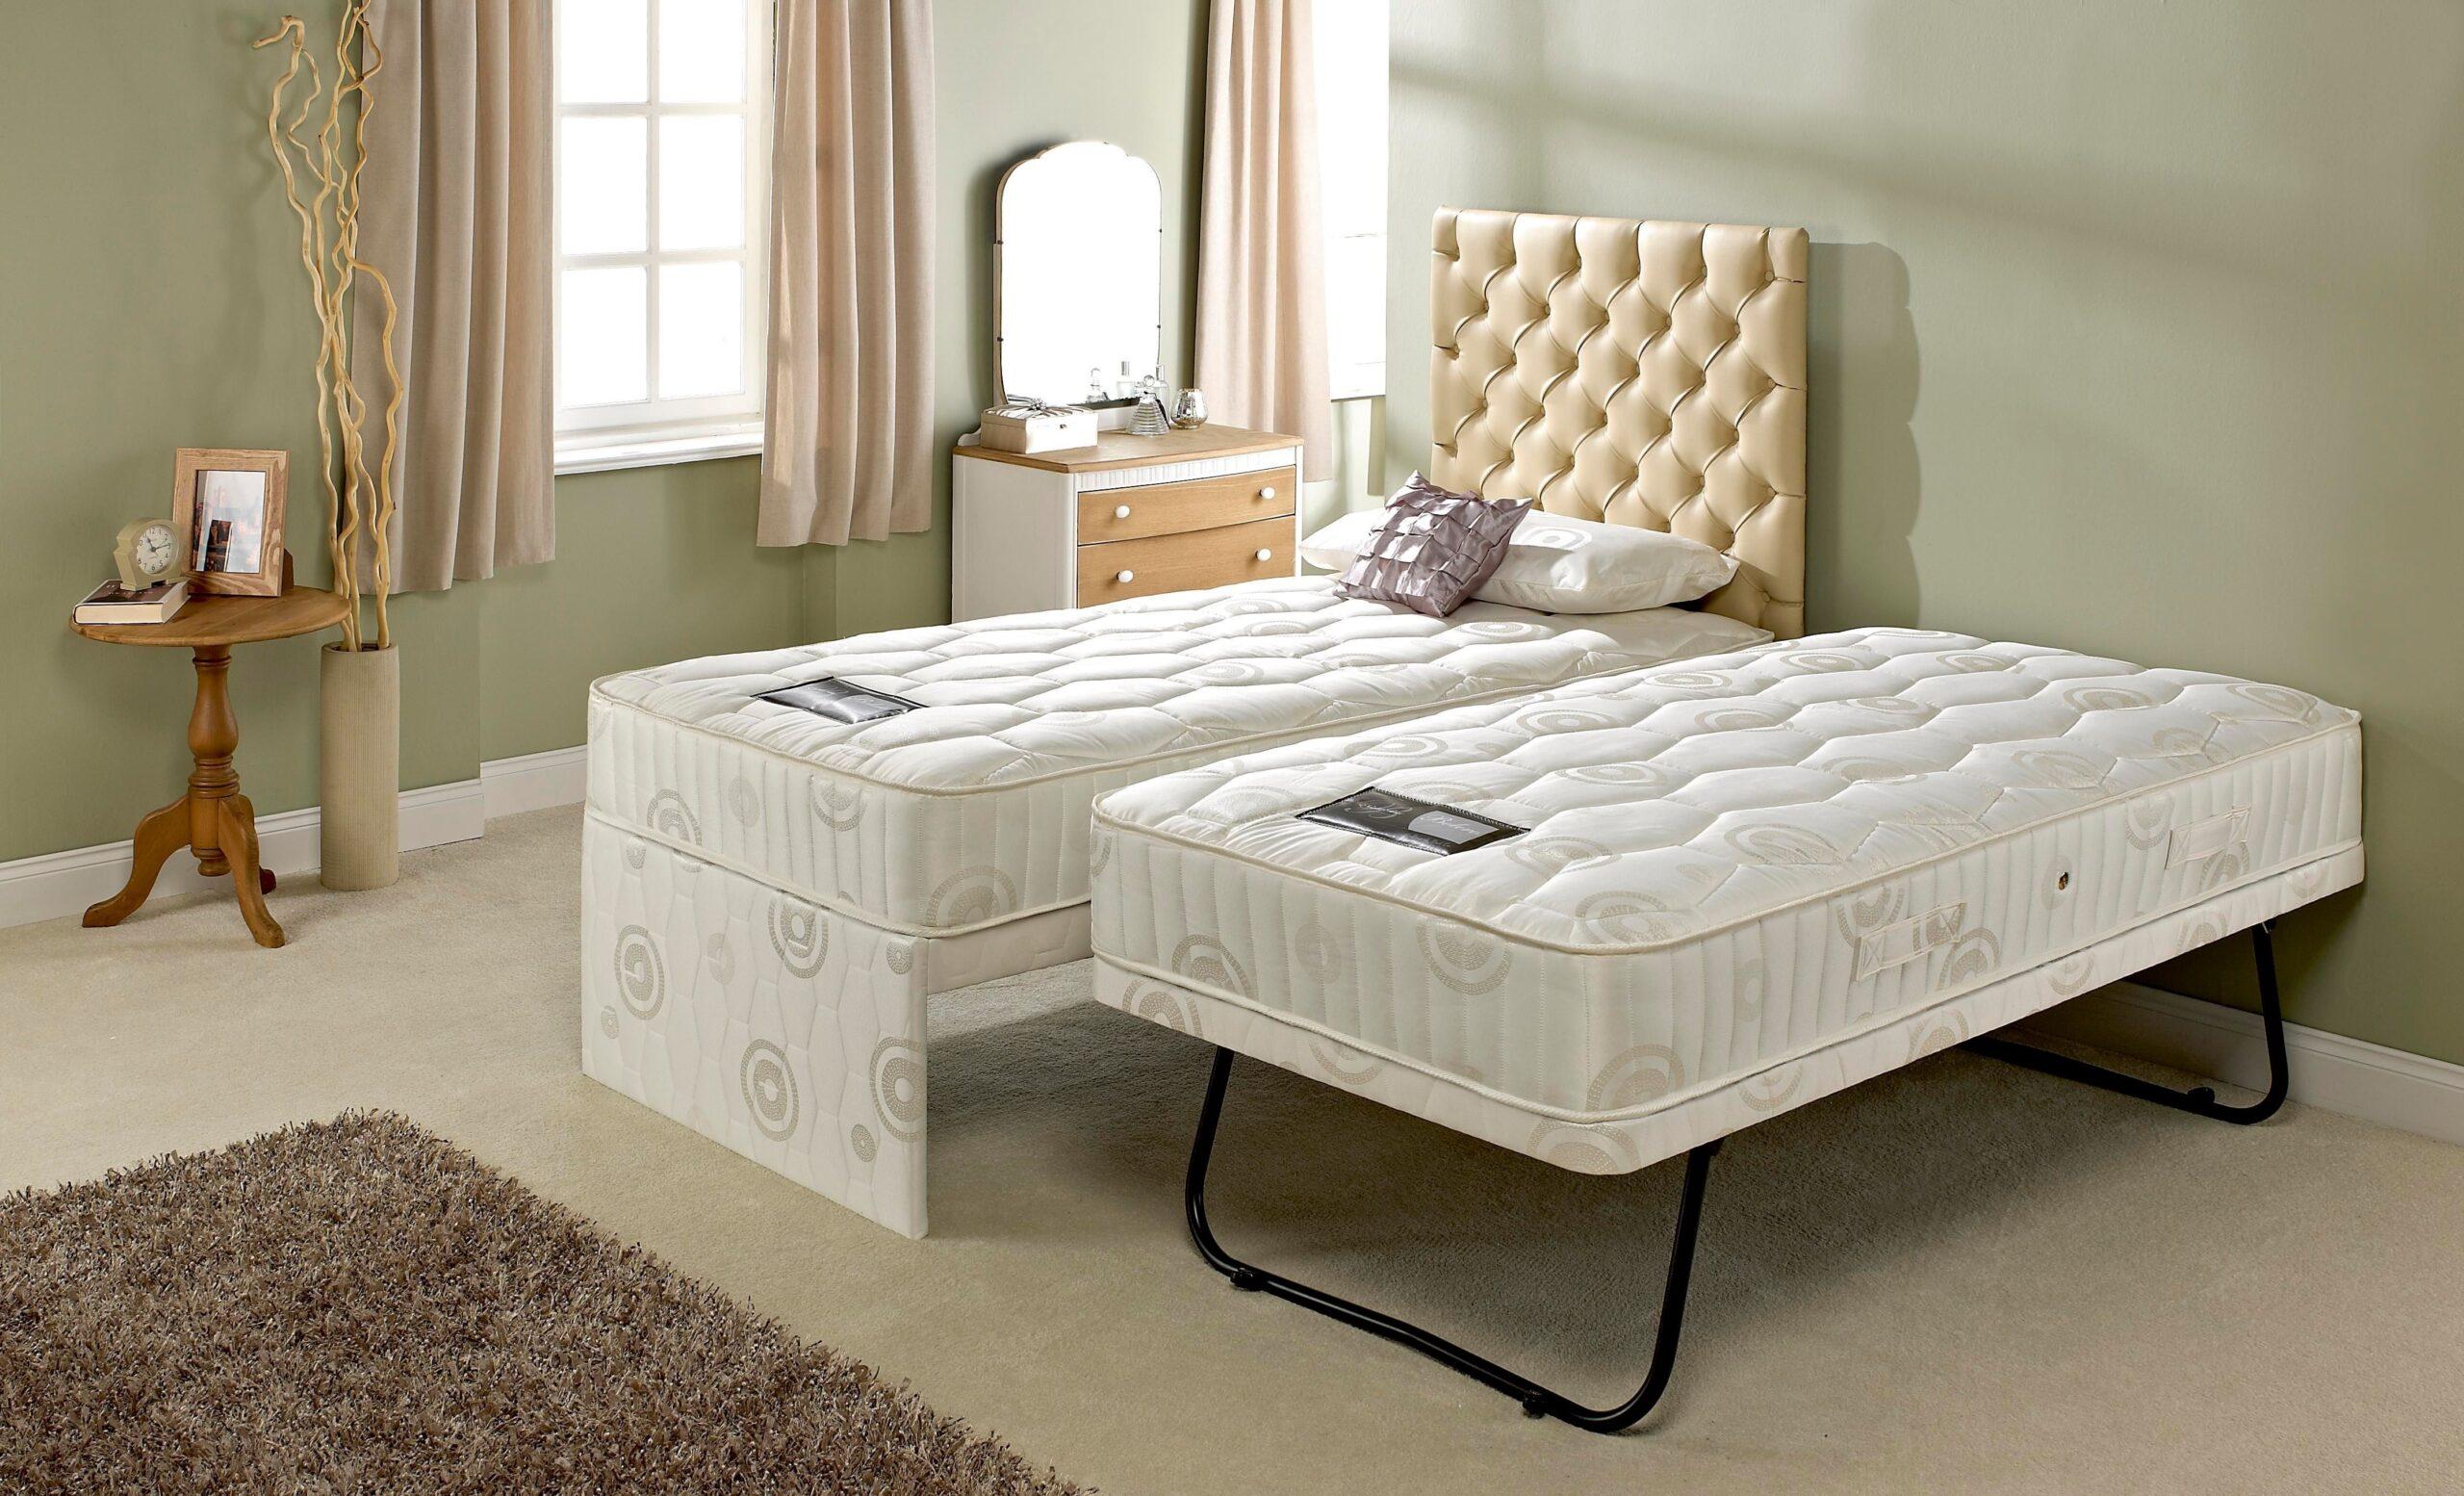 Full Size of Ausziehbares Doppelbett Ausziehbare Doppelbettcouch Ikea Voller Gre Bett Mit Ausziehbarem Ideen Wohnzimmer Ausziehbares Doppelbett